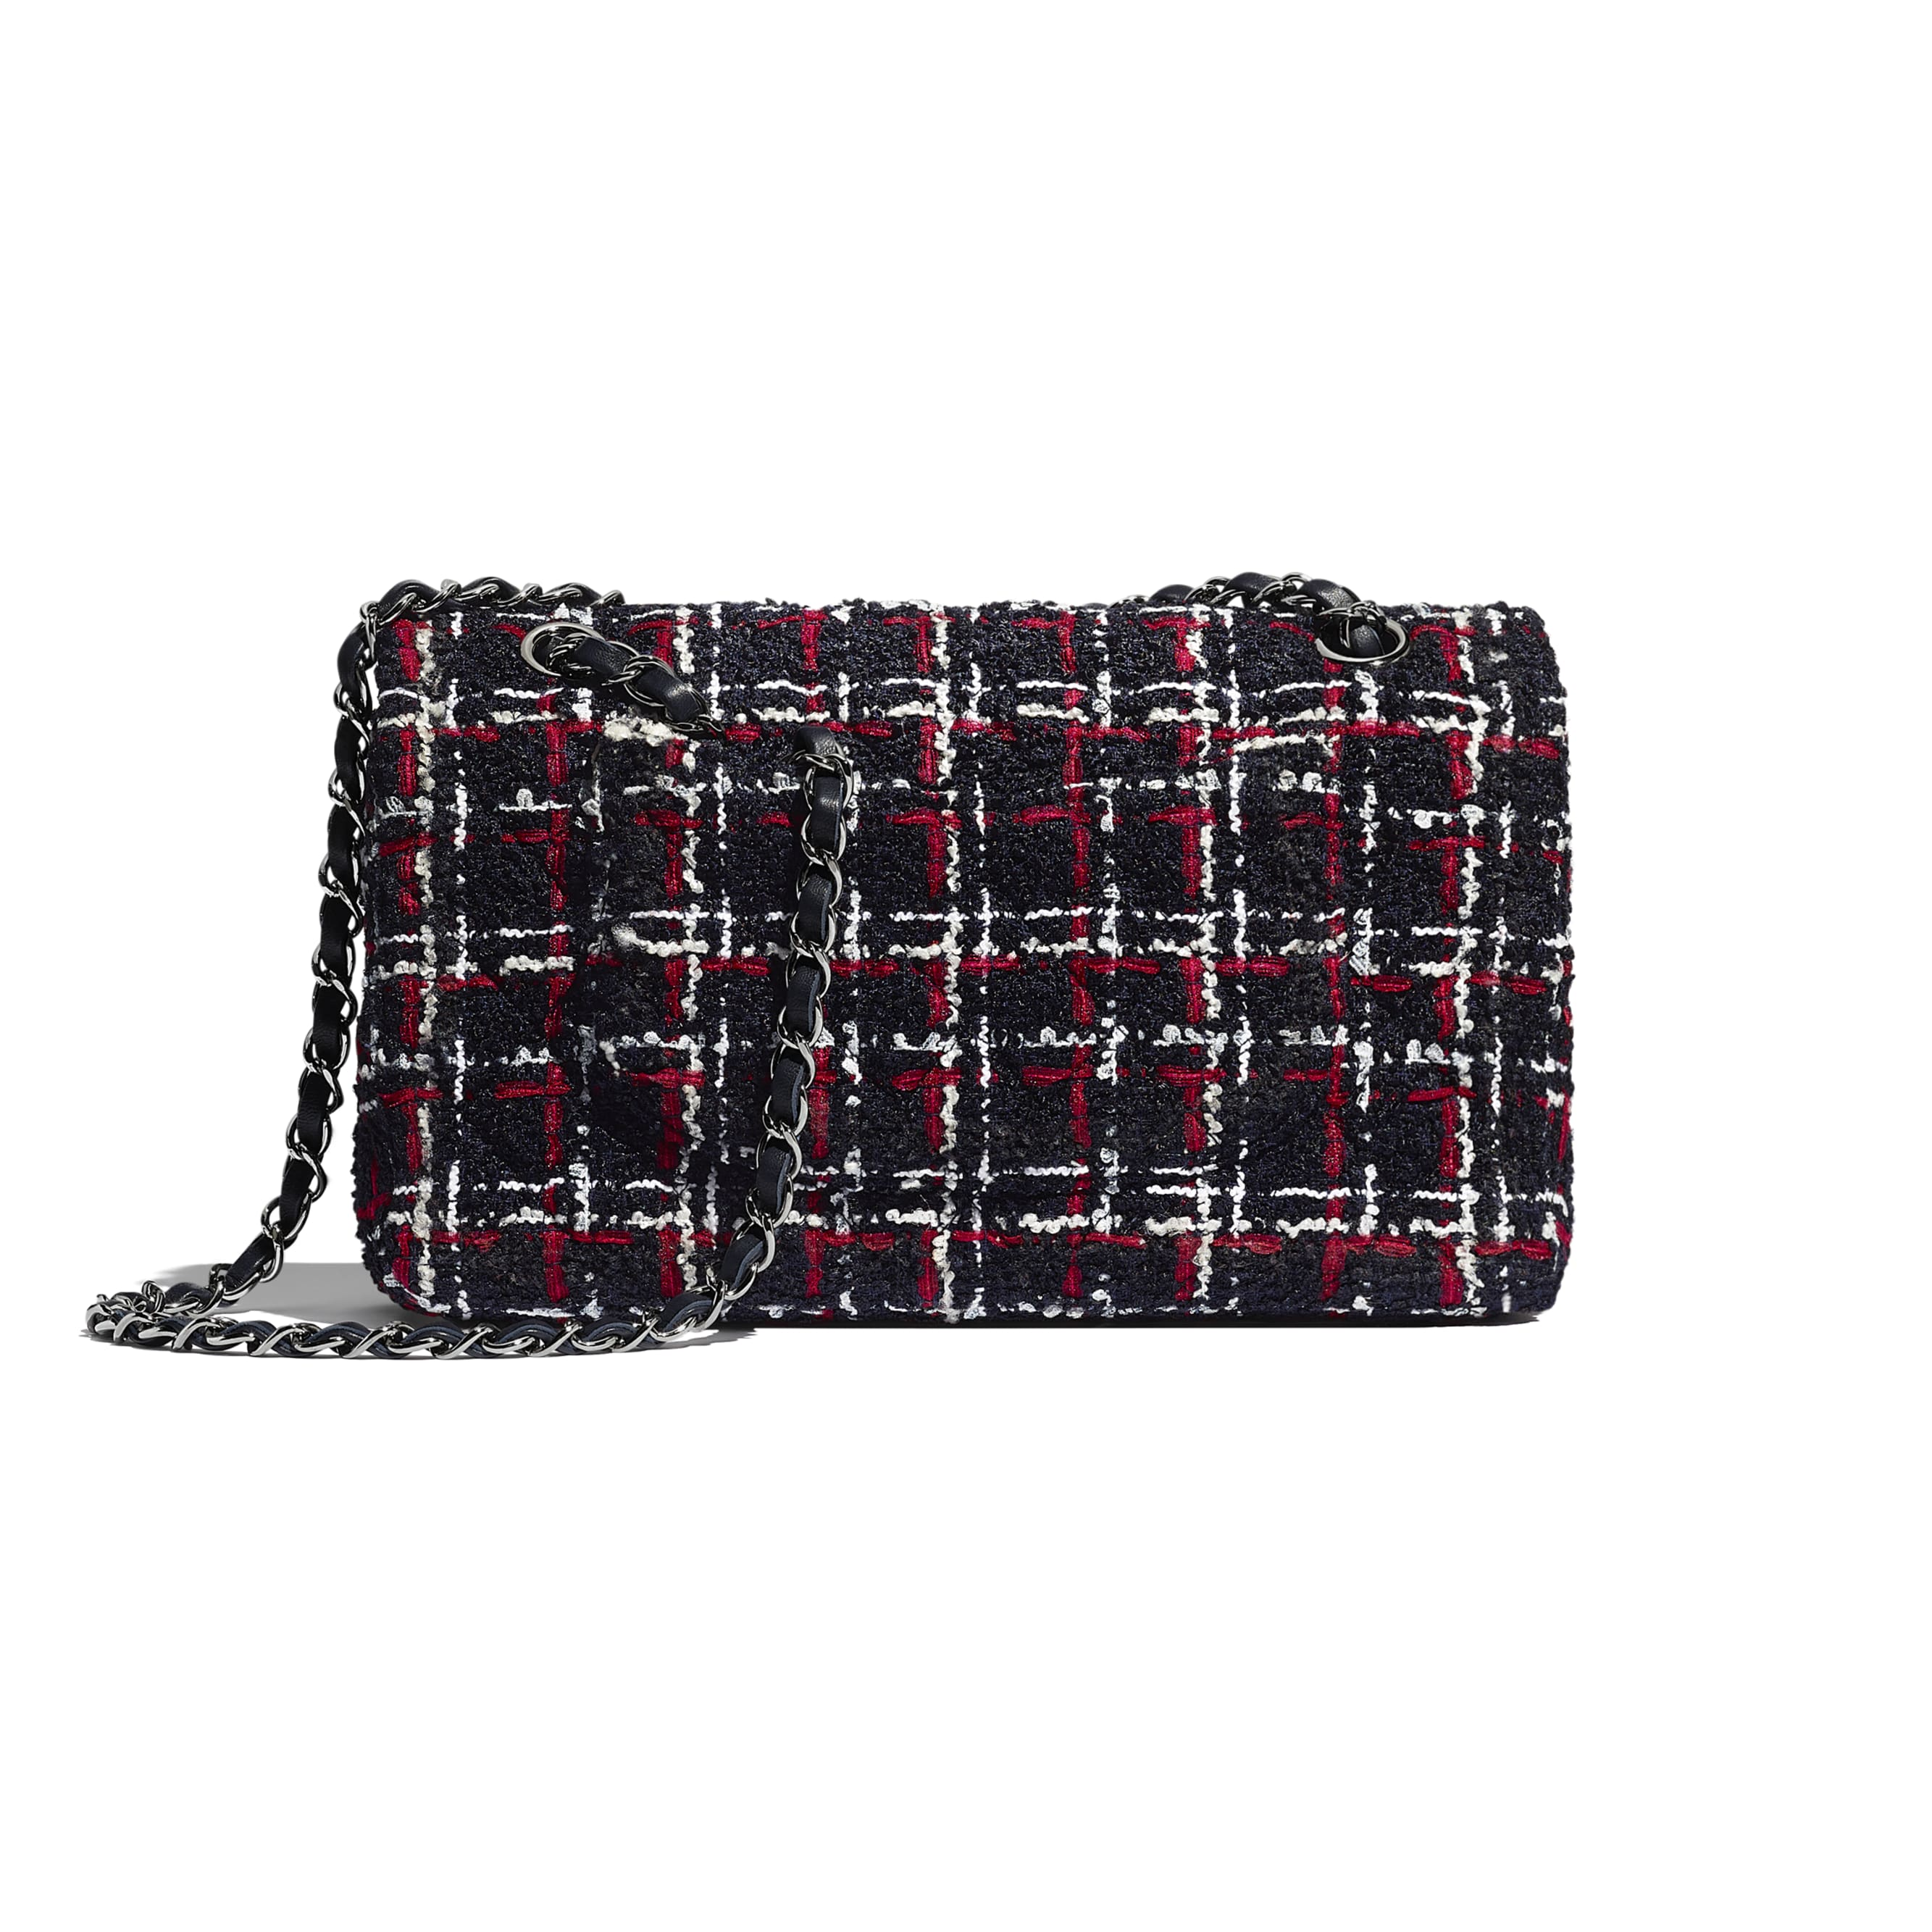 Classic Handbag - Navy Blue, White & Red - Tweed & Ruthenium-Finish Metal - CHANEL - Alternative view - see standard sized version